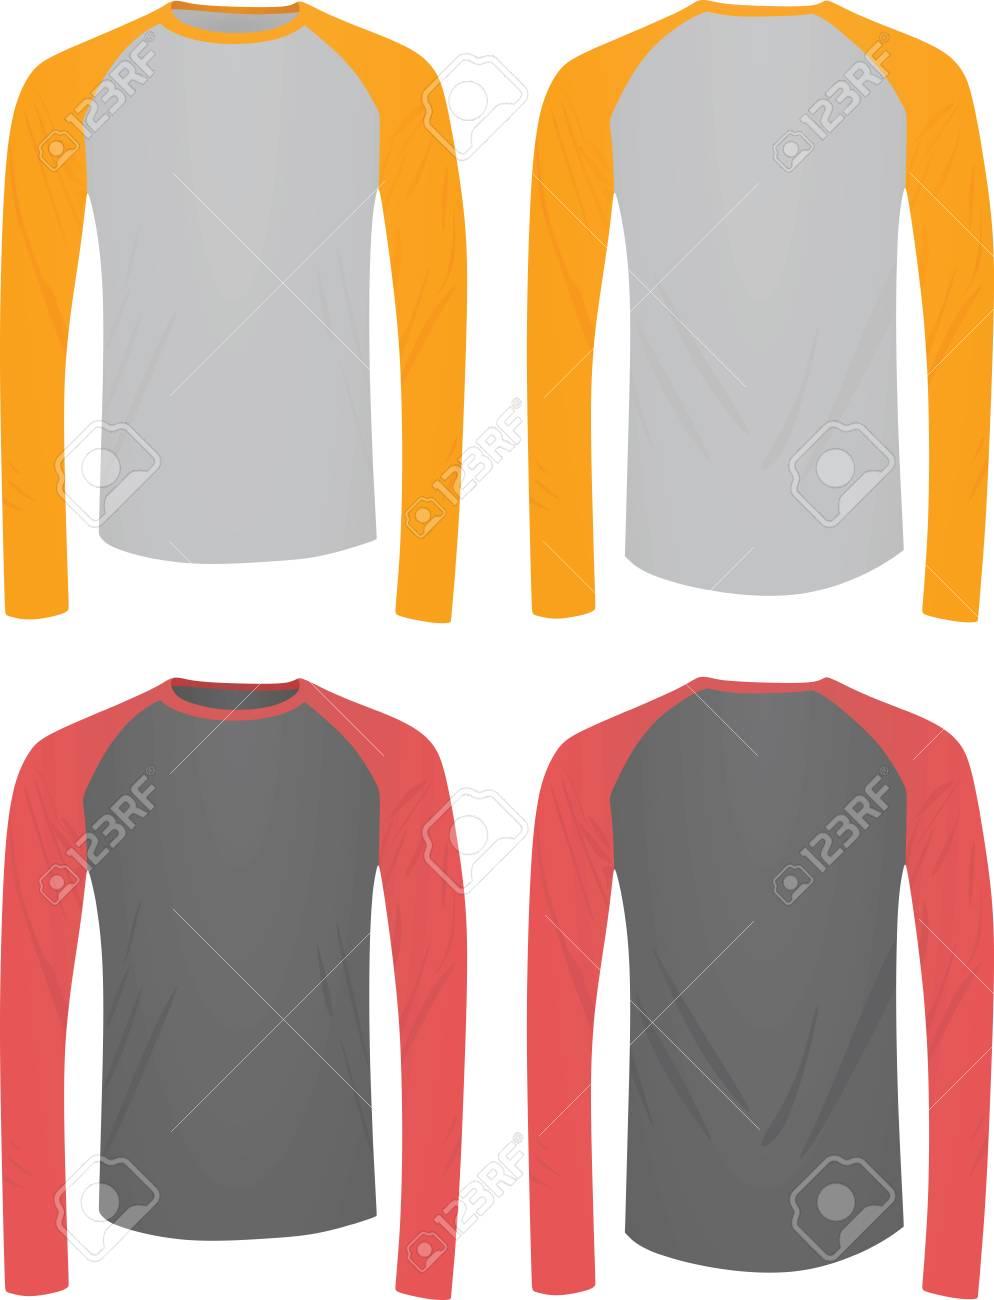 Long Sleeve Shirt Vector : sleeve, shirt, vector, Sleeved, Shirt, Colors., Vector, Illustration, Royalty, Cliparts,, Vectors,, Stock, Illustration., Image, 118698860.